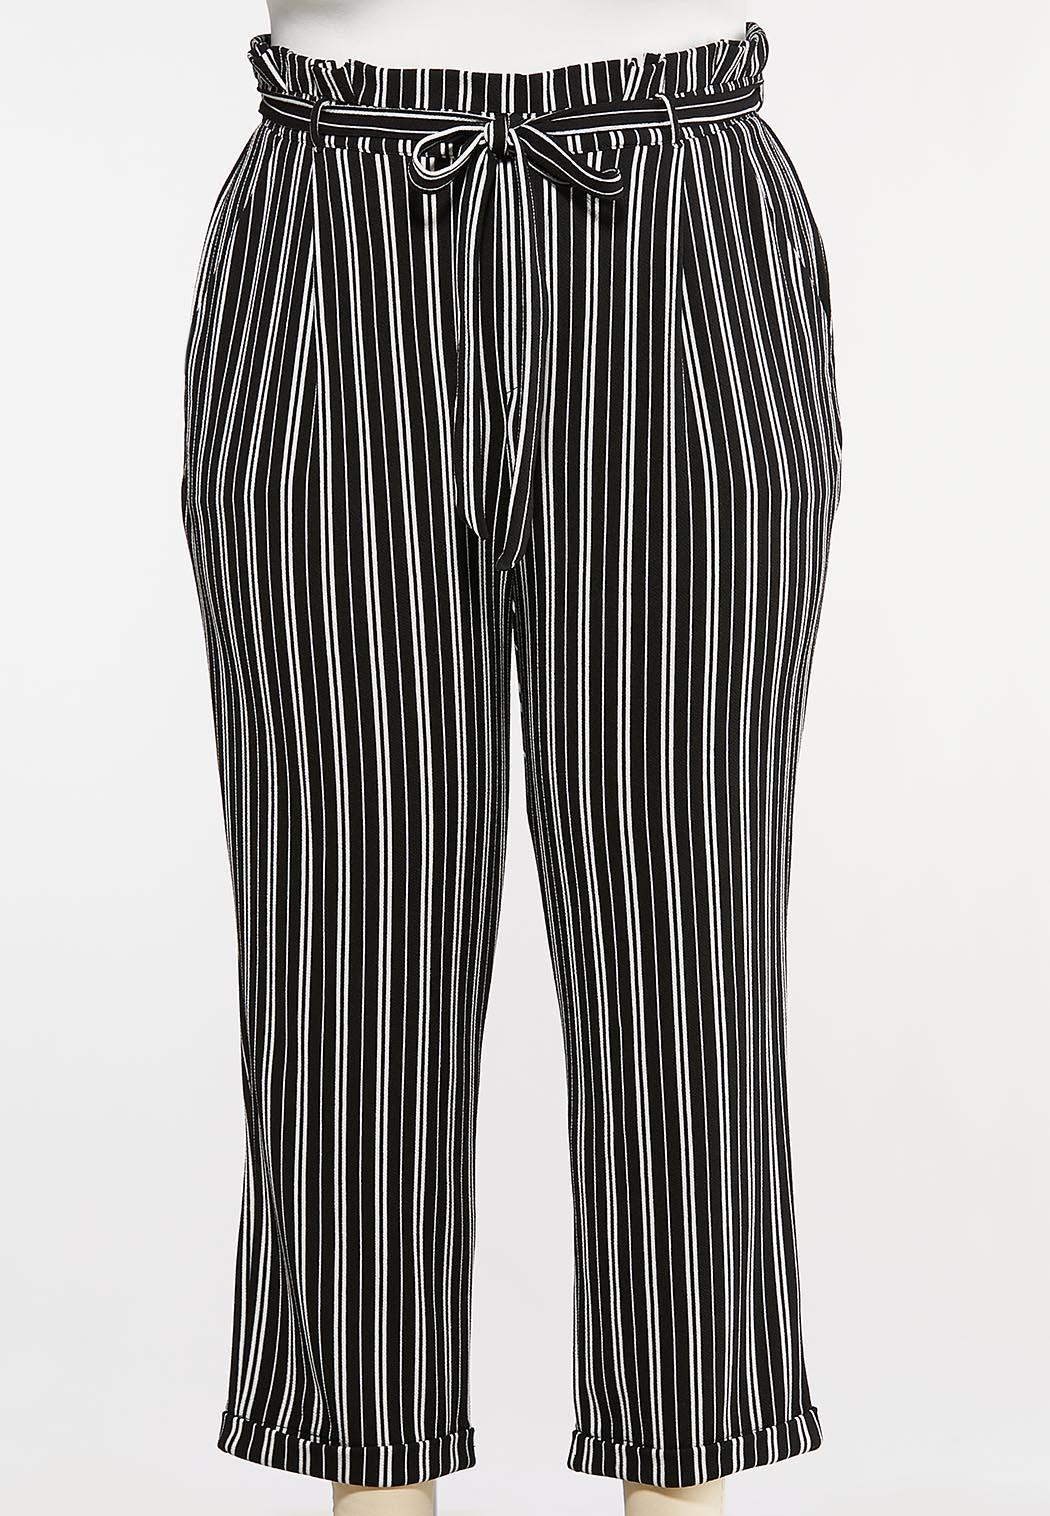 Plus Size Black And White Tie Pants